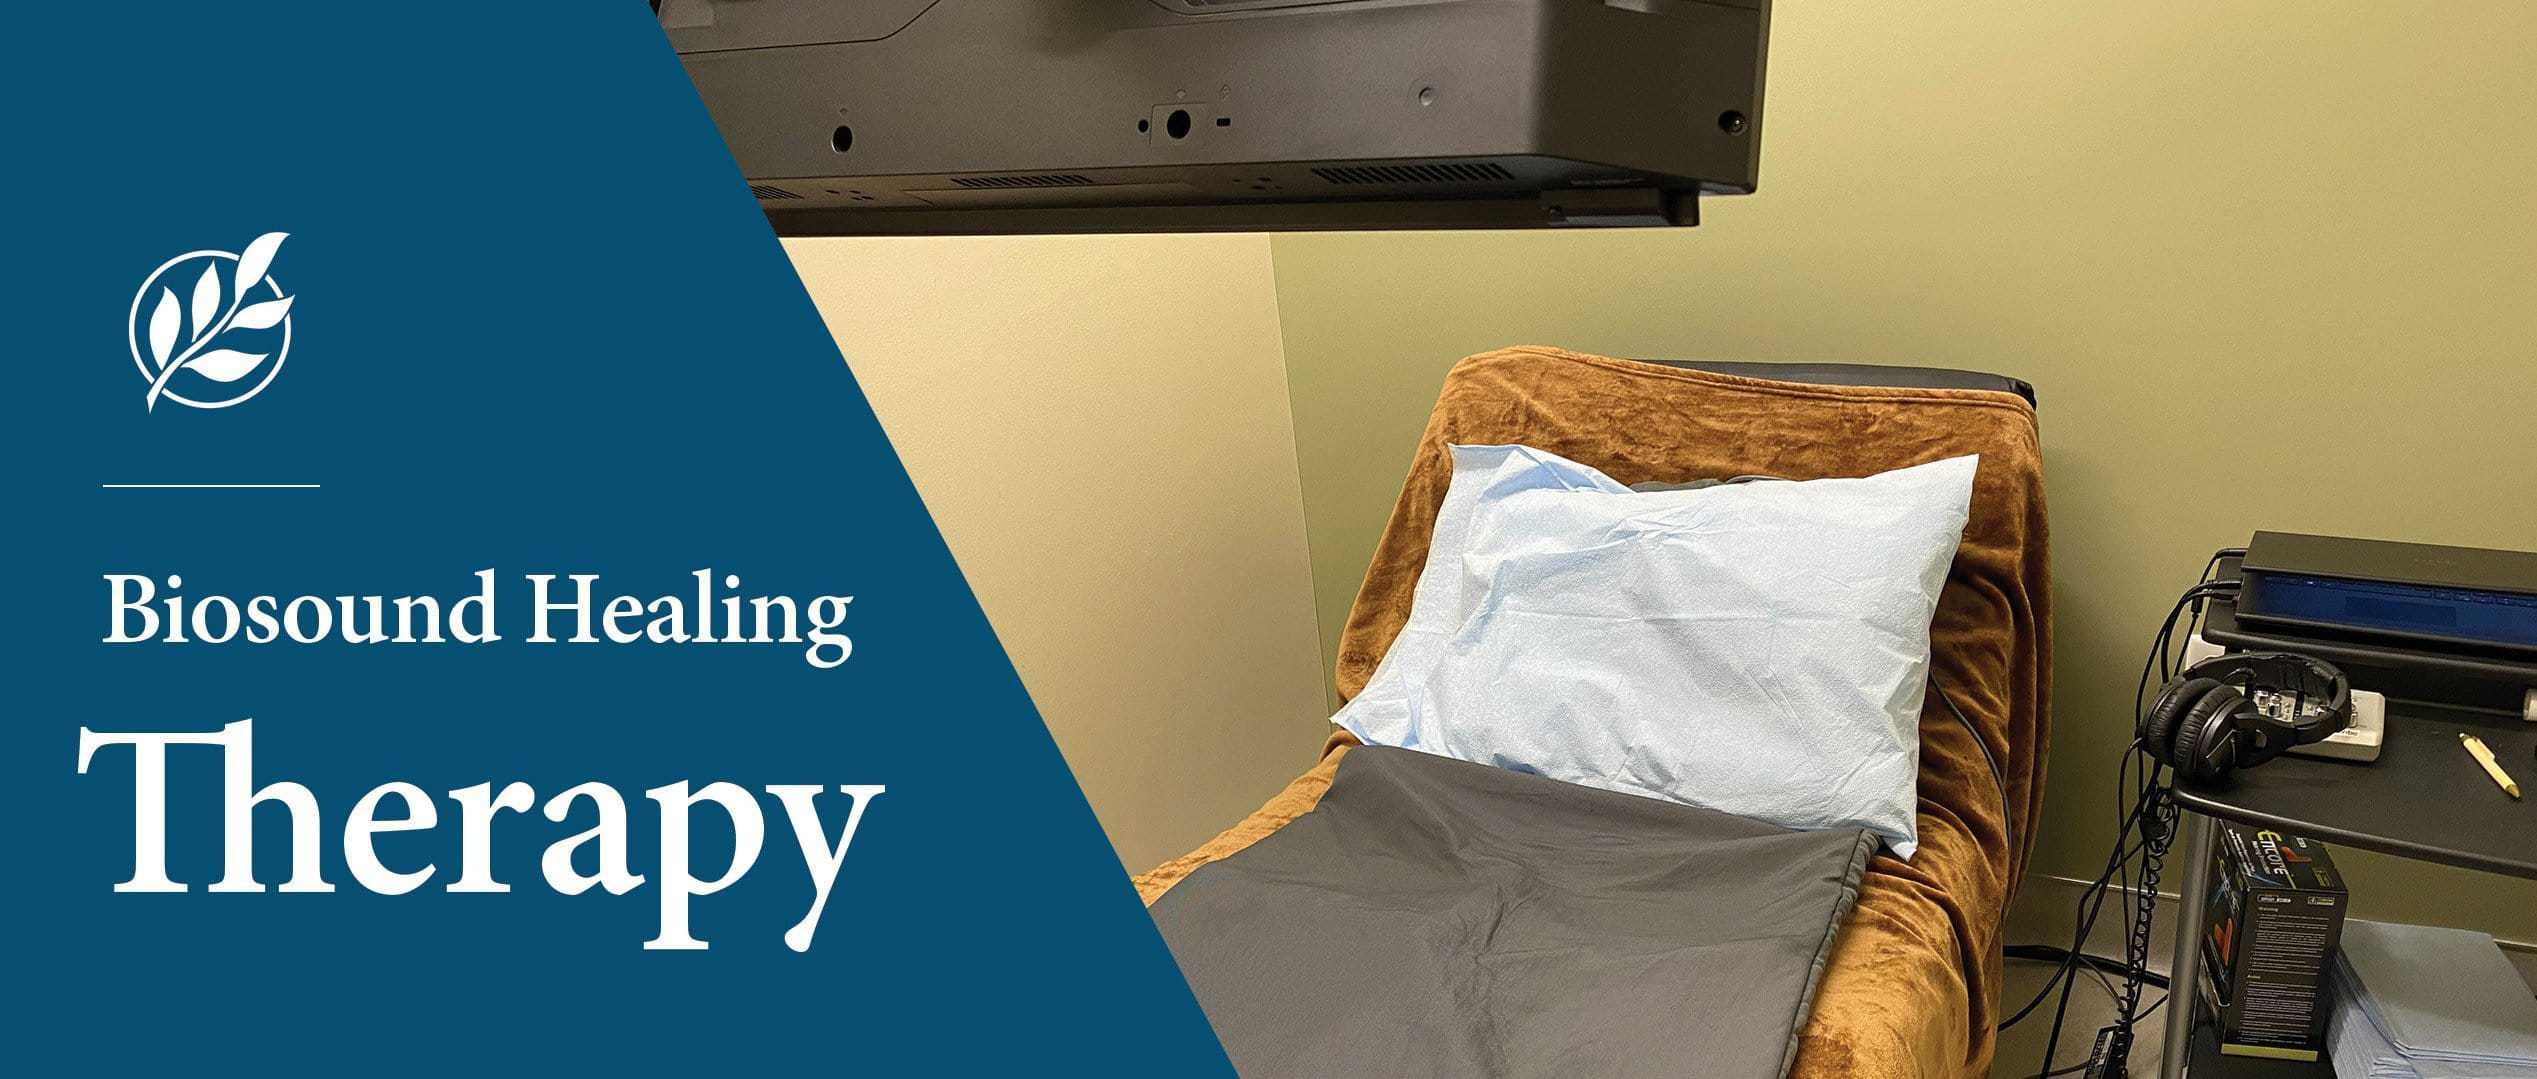 Biosound healing therapy california